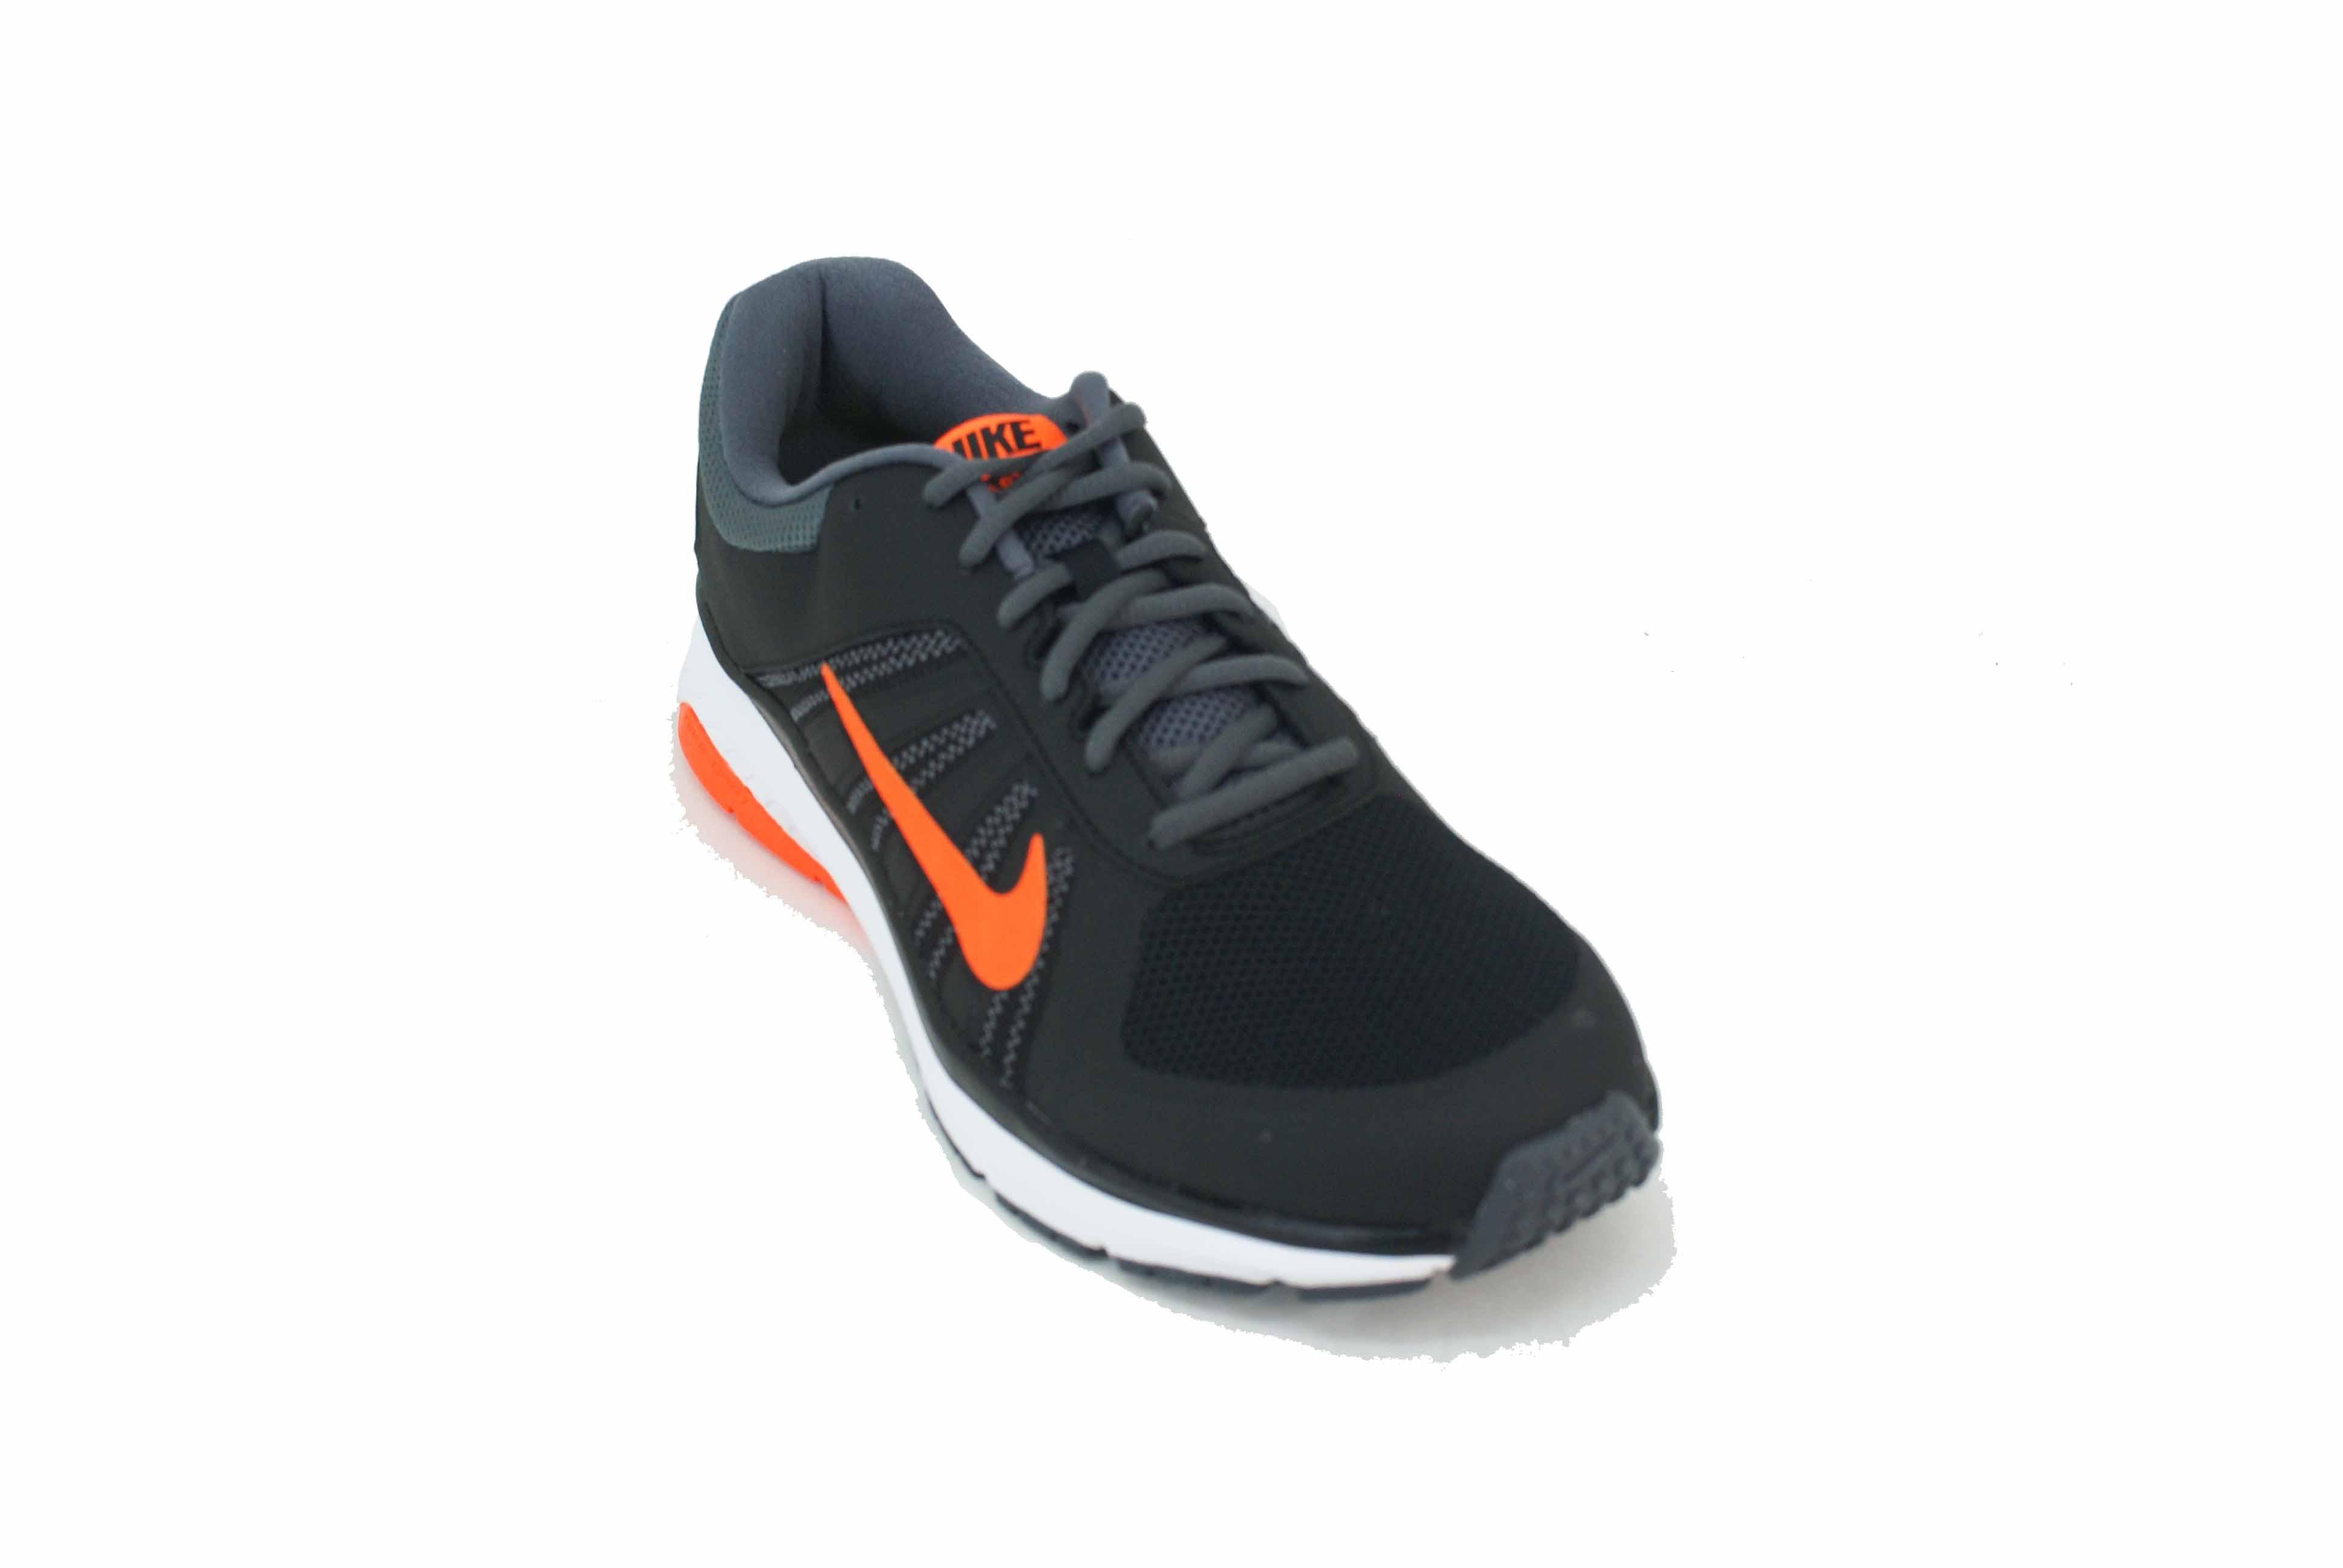 doble transatlántico Enemistarse  Zapatilla Nike Dart 12 MSL Negro/Naranja Hombre - Zapatillas - E-Shop